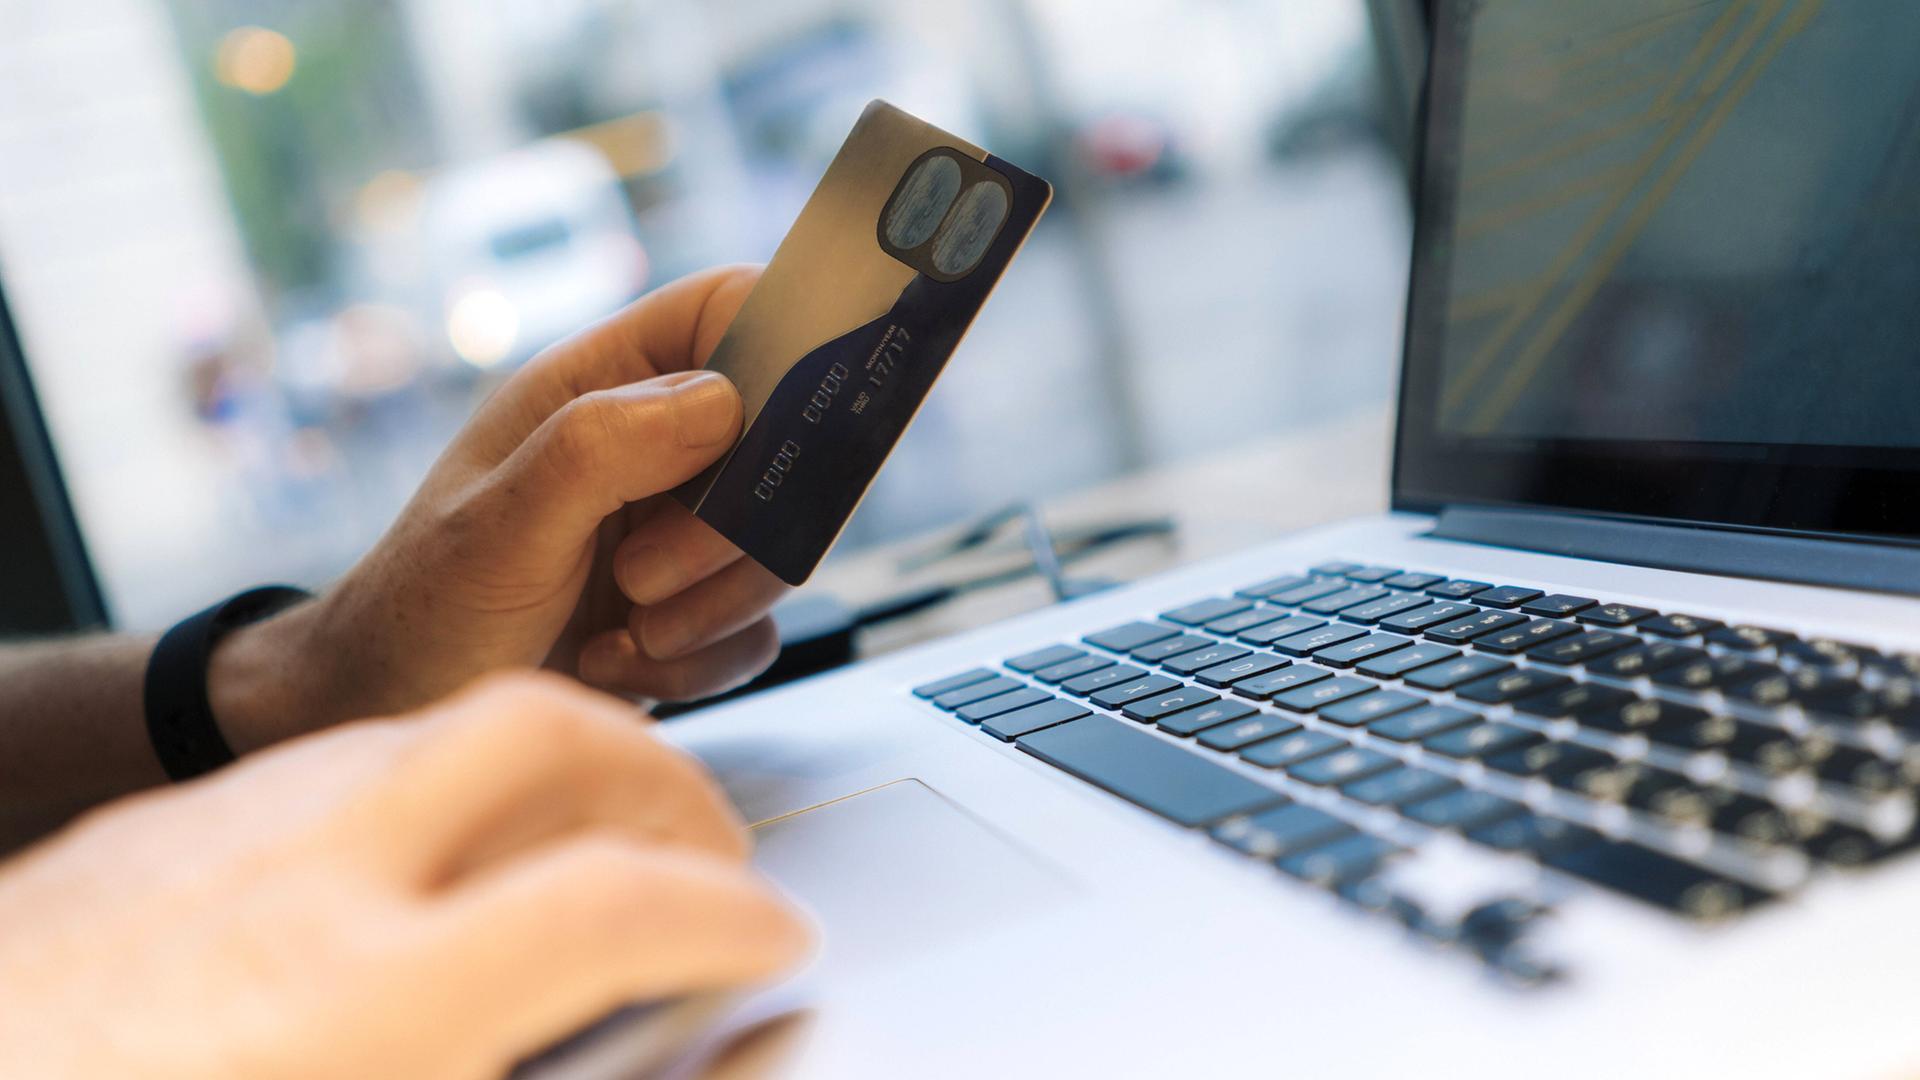 8c51622ec0ac13 Cashback-Portale  Geld zurück beim Online-Shopping - ZDFmediathek